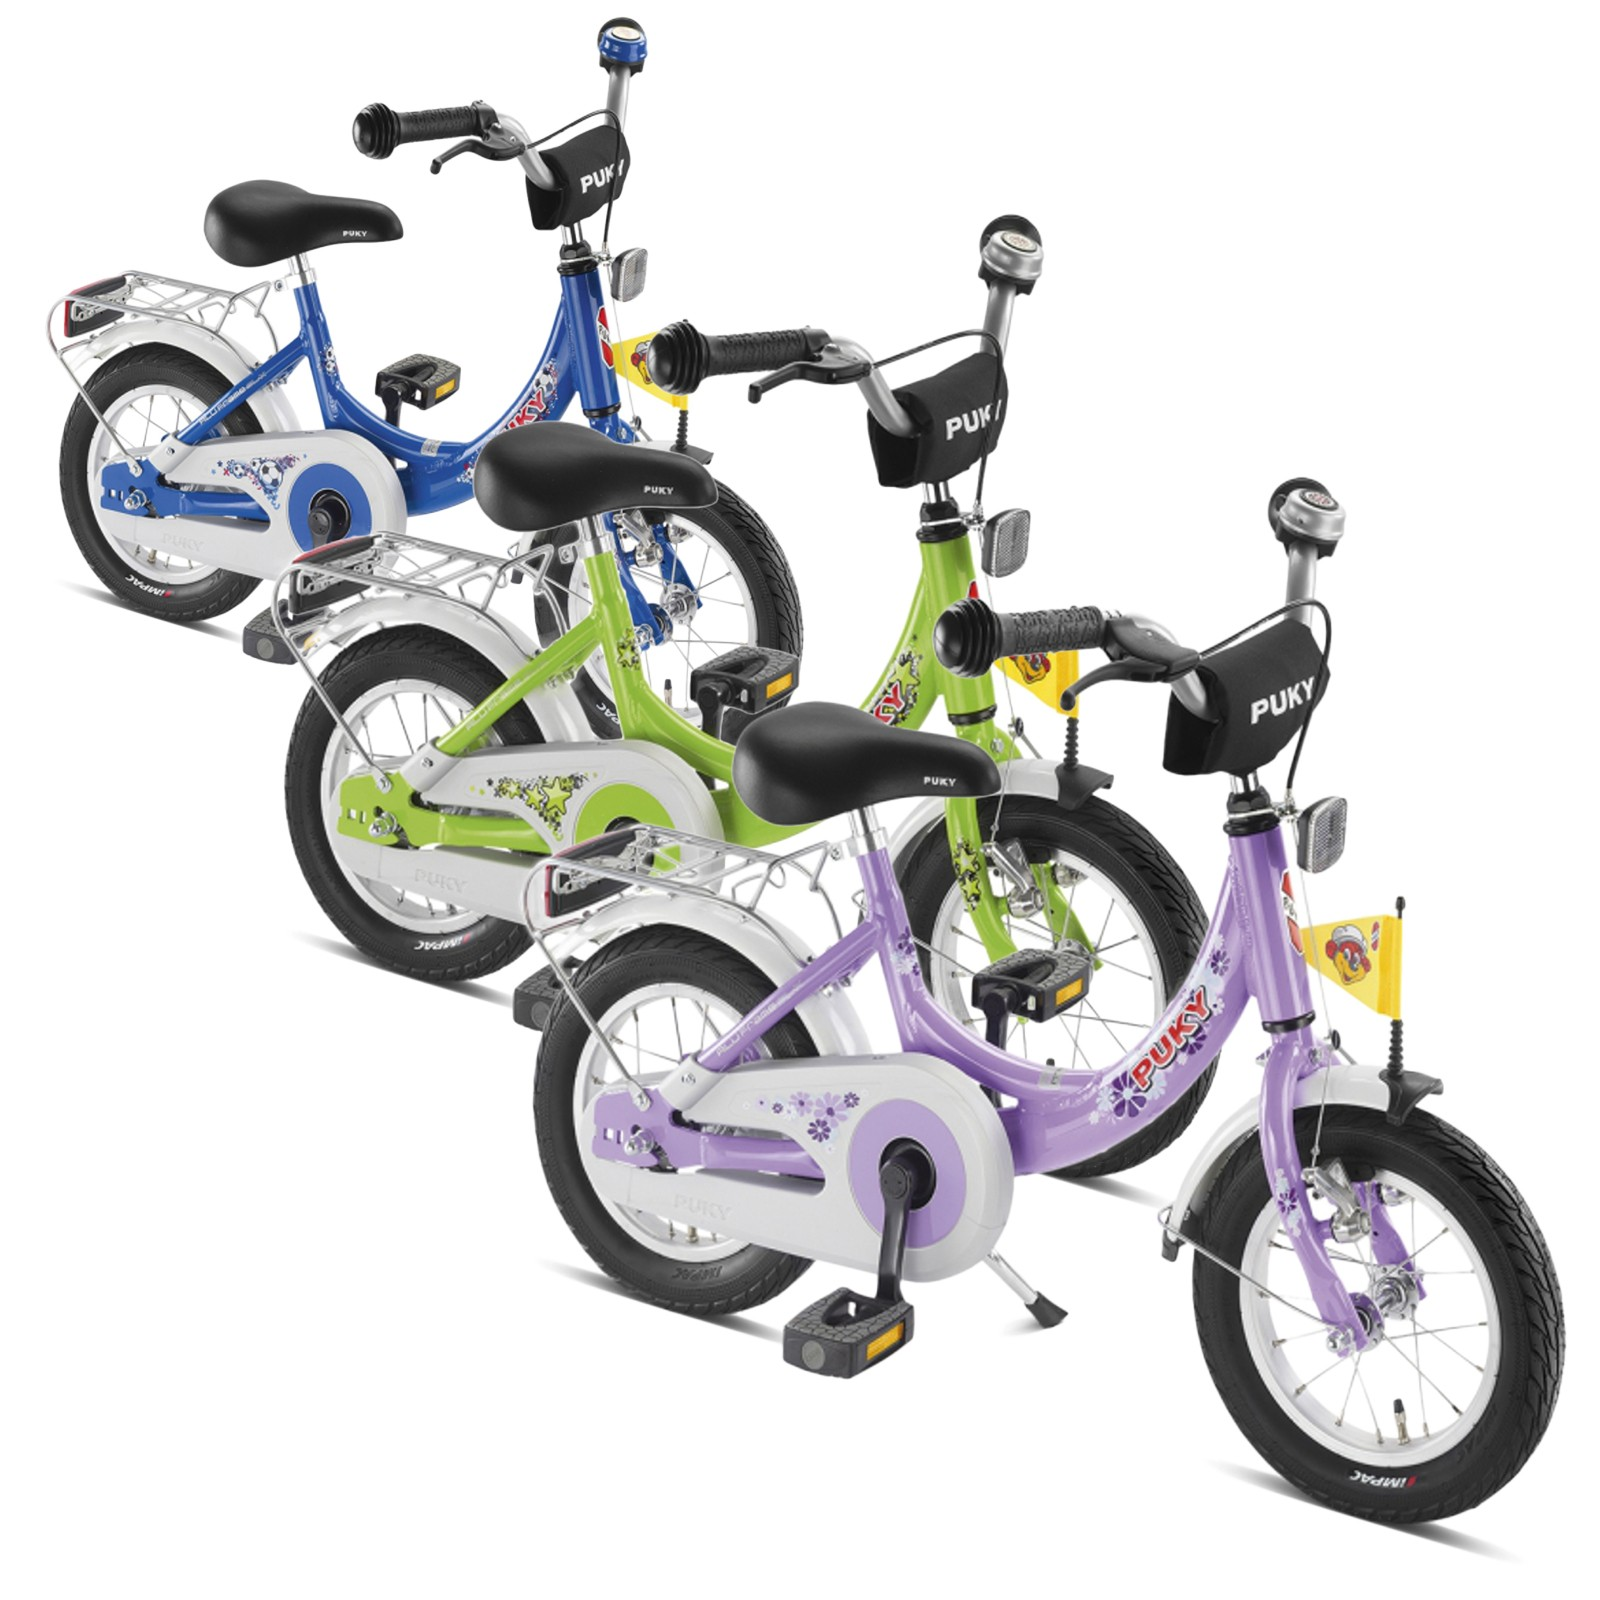 puky children 39 s bike zl 12 1 alu buy with 69 customer. Black Bedroom Furniture Sets. Home Design Ideas